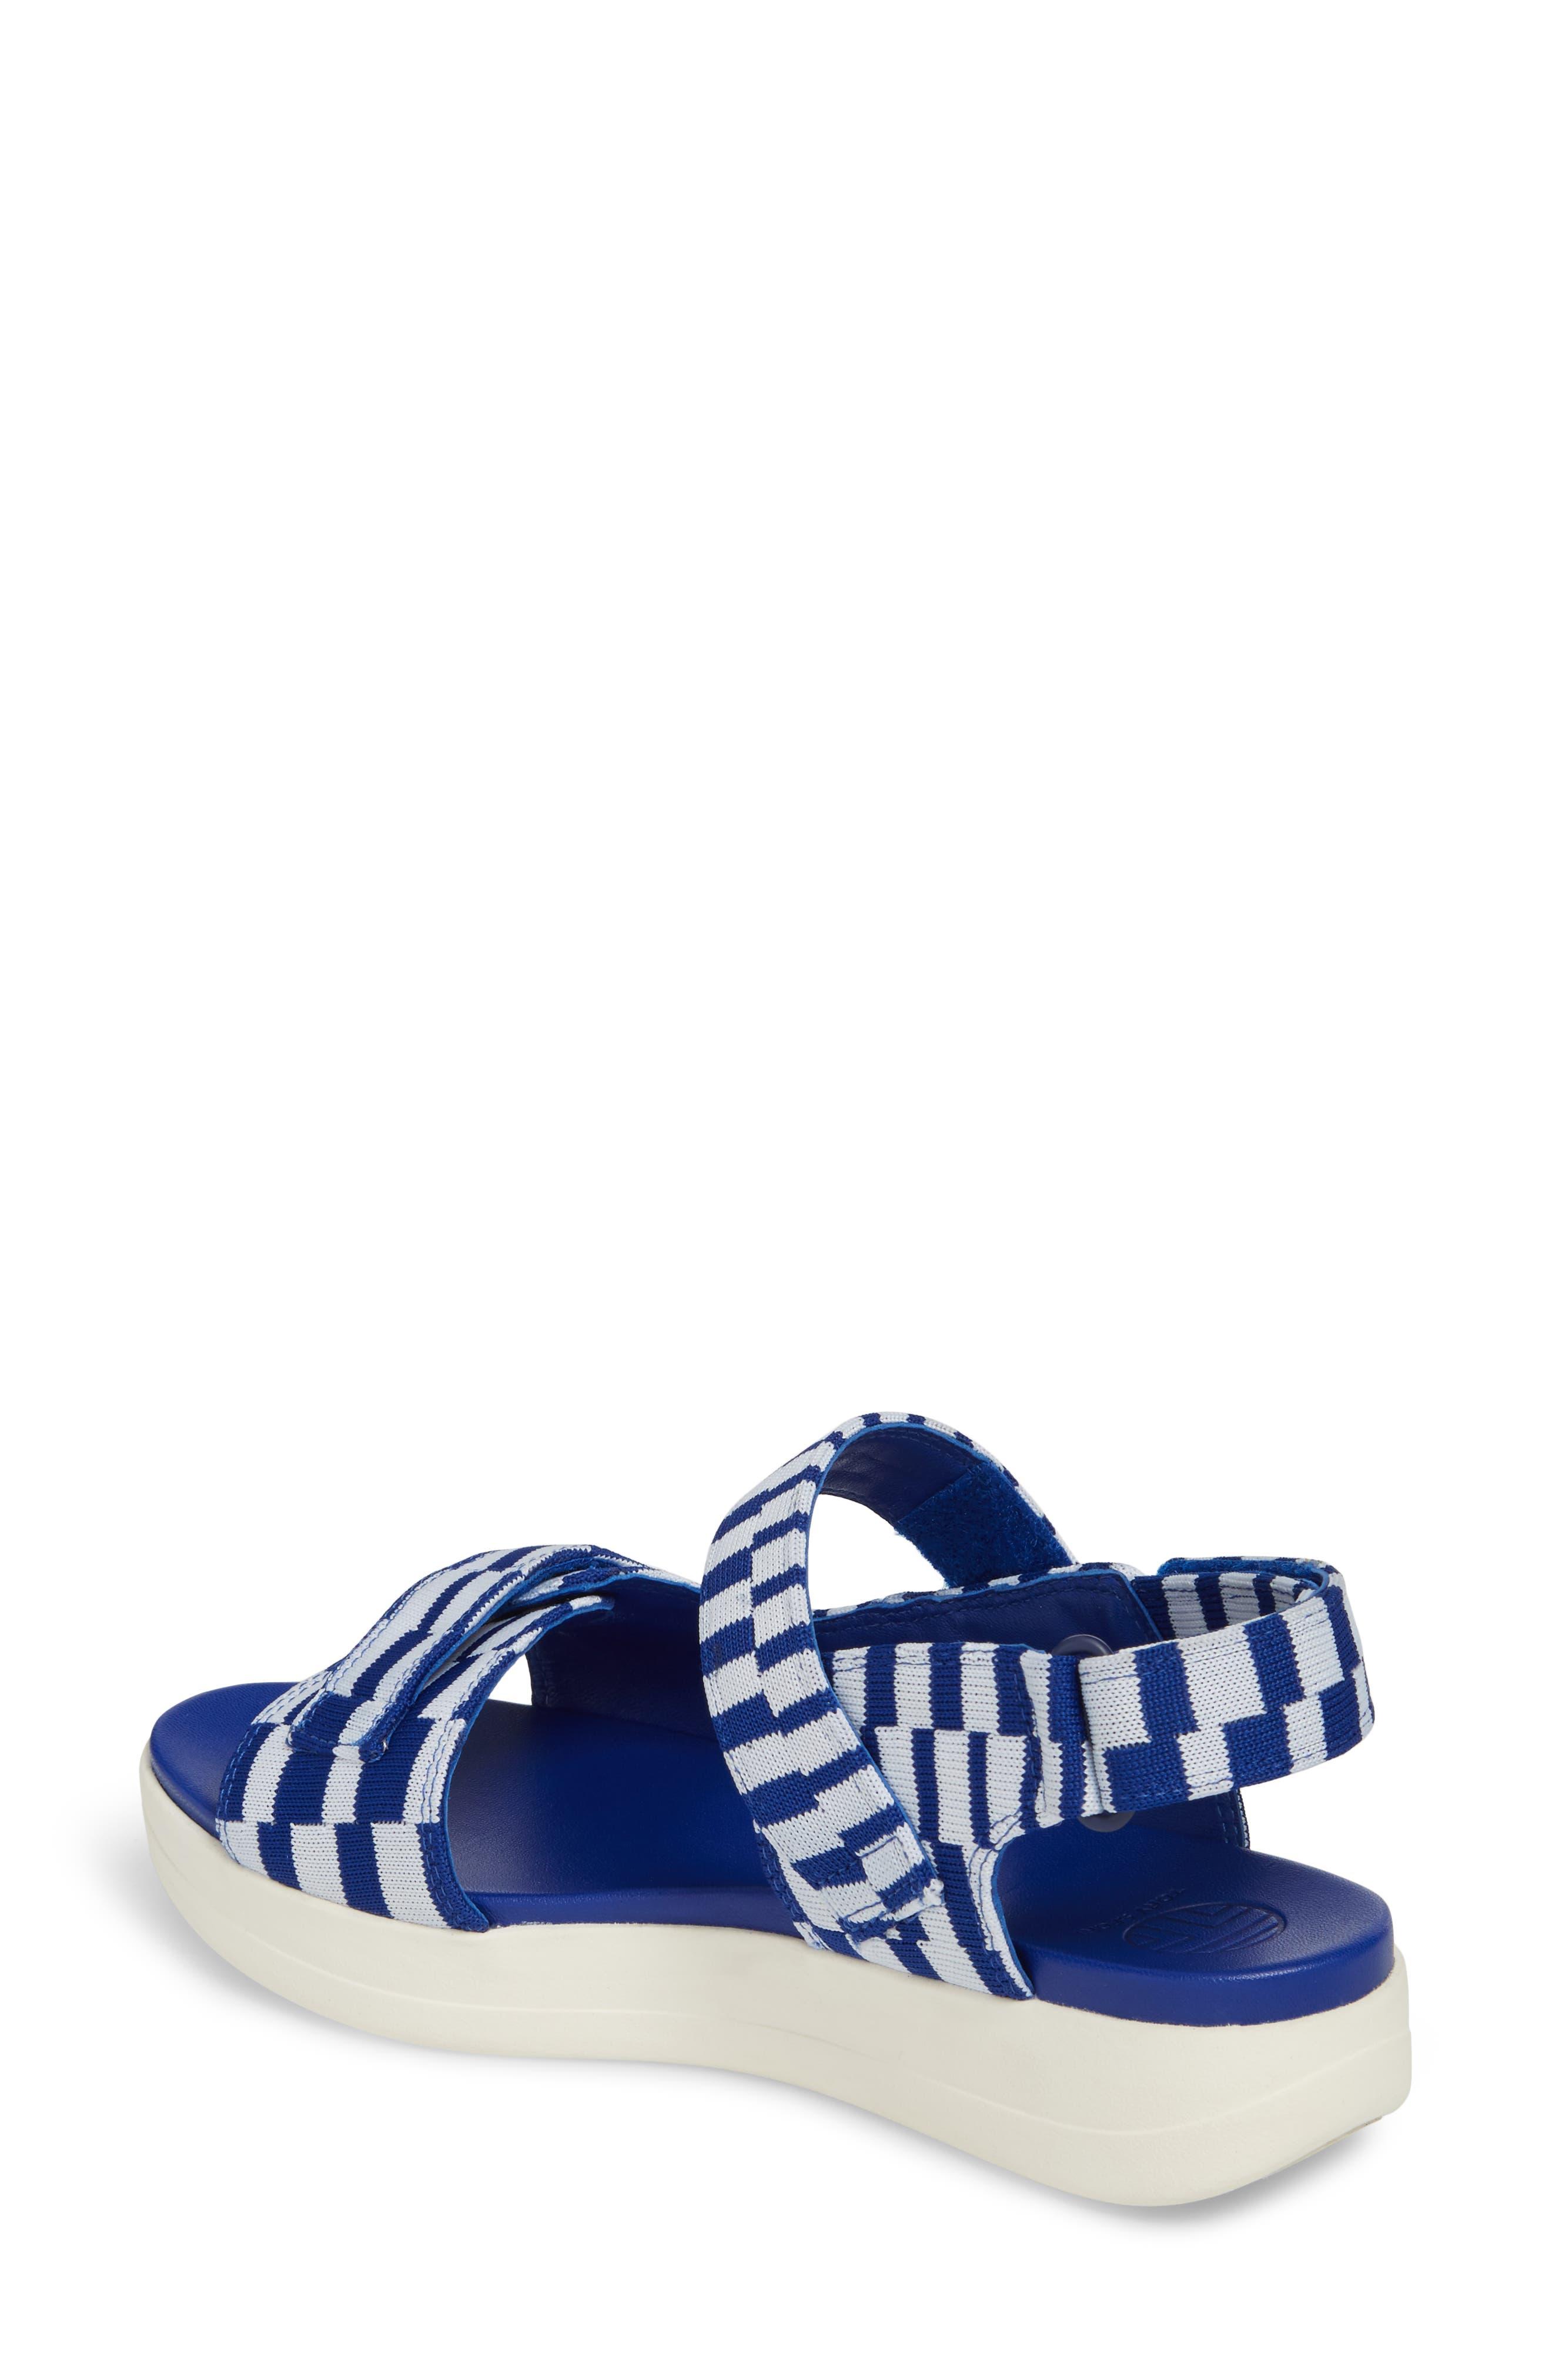 Flatform Sandal,                             Alternate thumbnail 2, color,